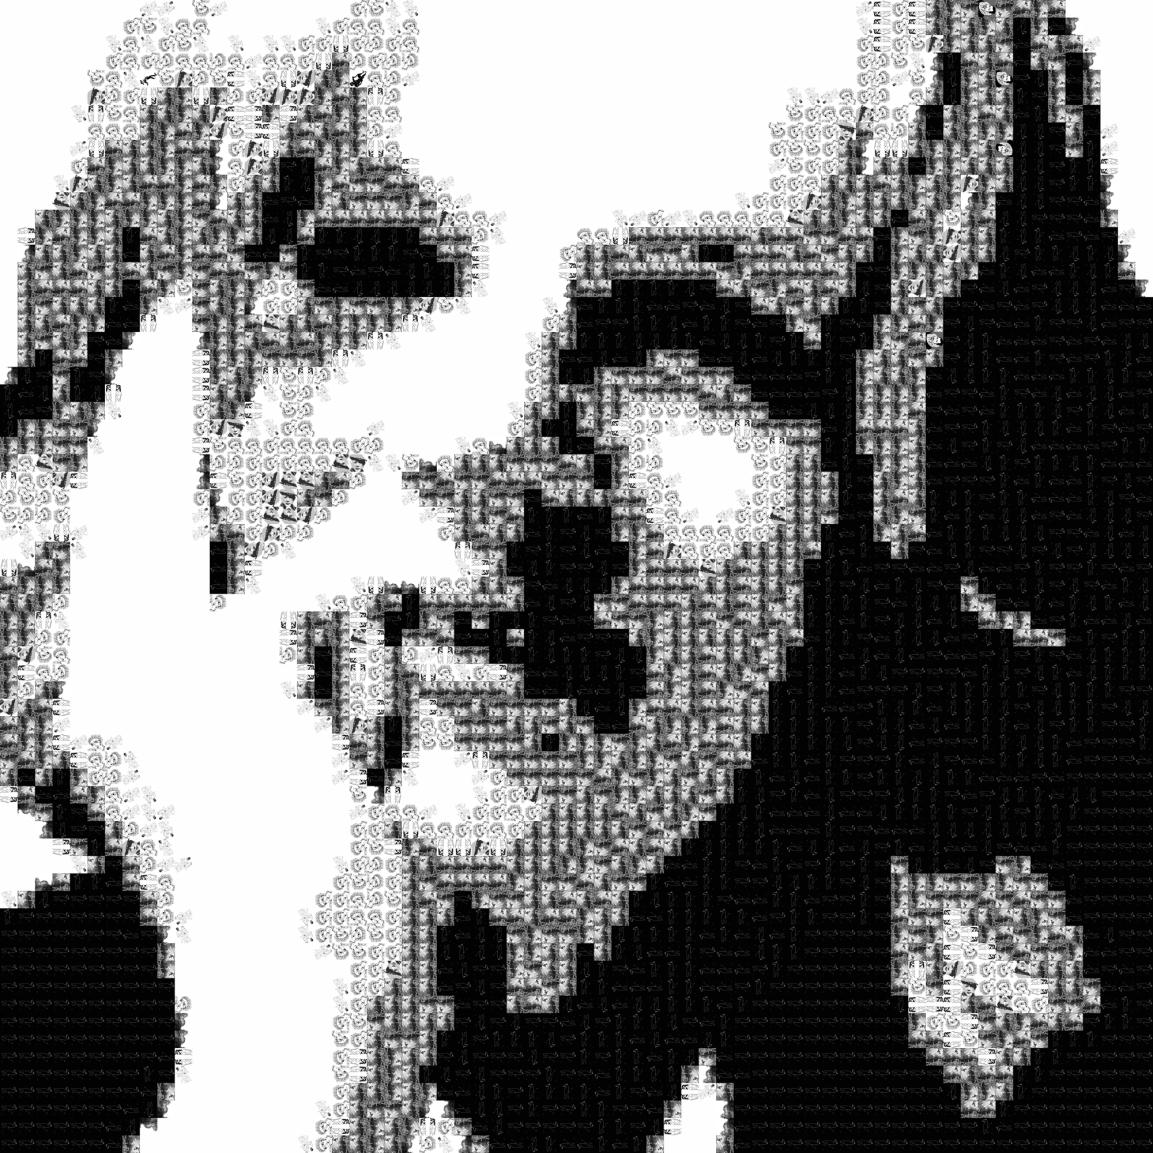 garbade,daniel,En cama con,Greco,Picasso,Iglesia ,San Sebastián,Toledo, Consorcio,Artzeitmagazine,exposición,septiembre,Kunsthaus, Moma